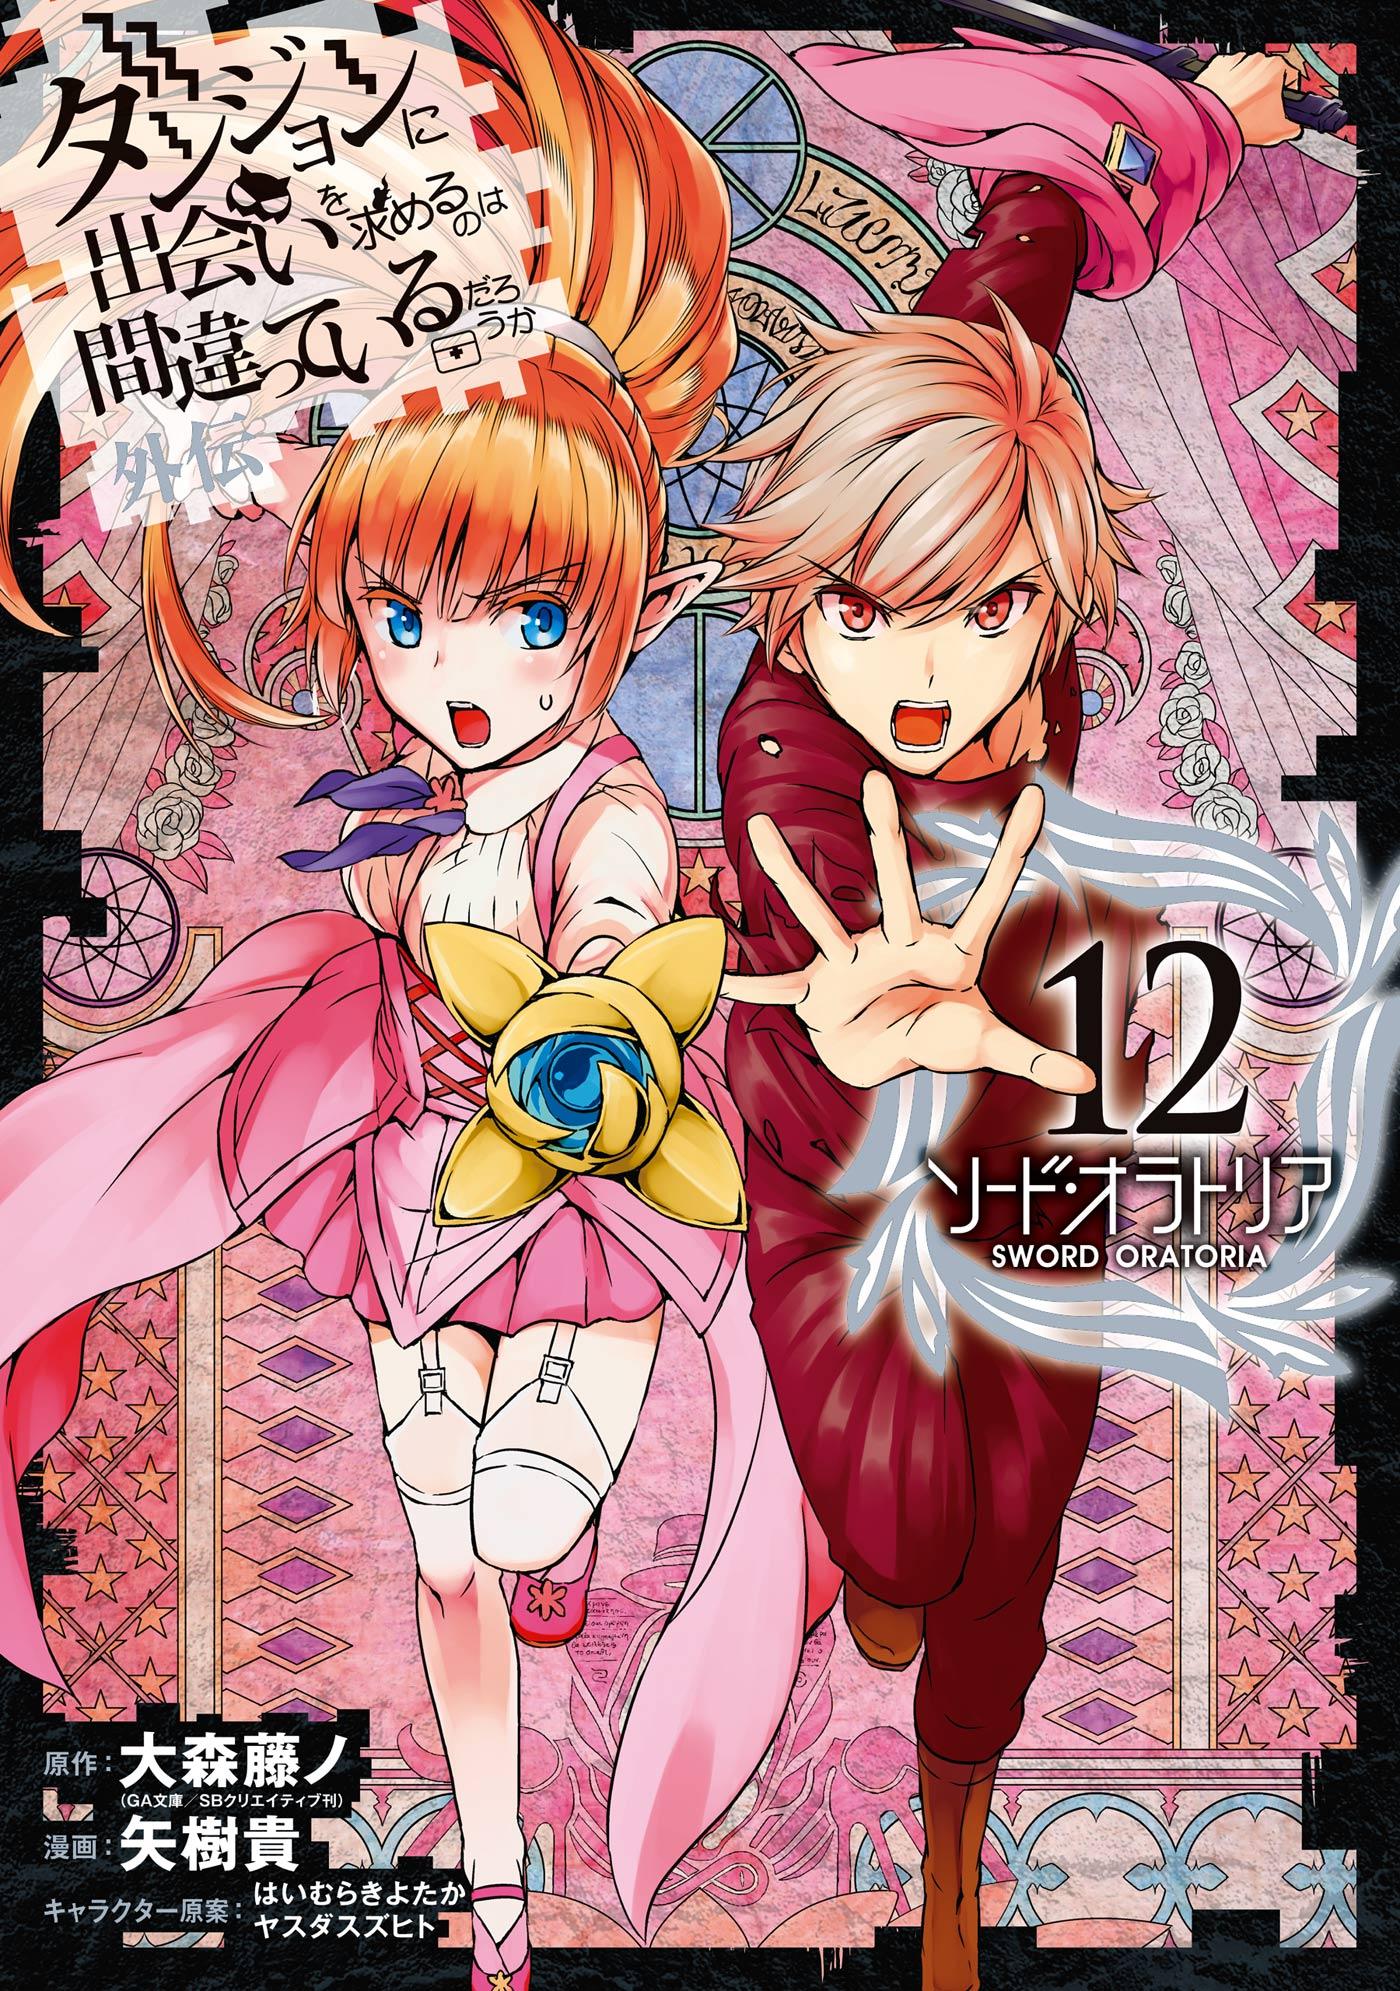 Sword Oratoria Manga Volume 12 | DanMachi Wiki | FANDOM